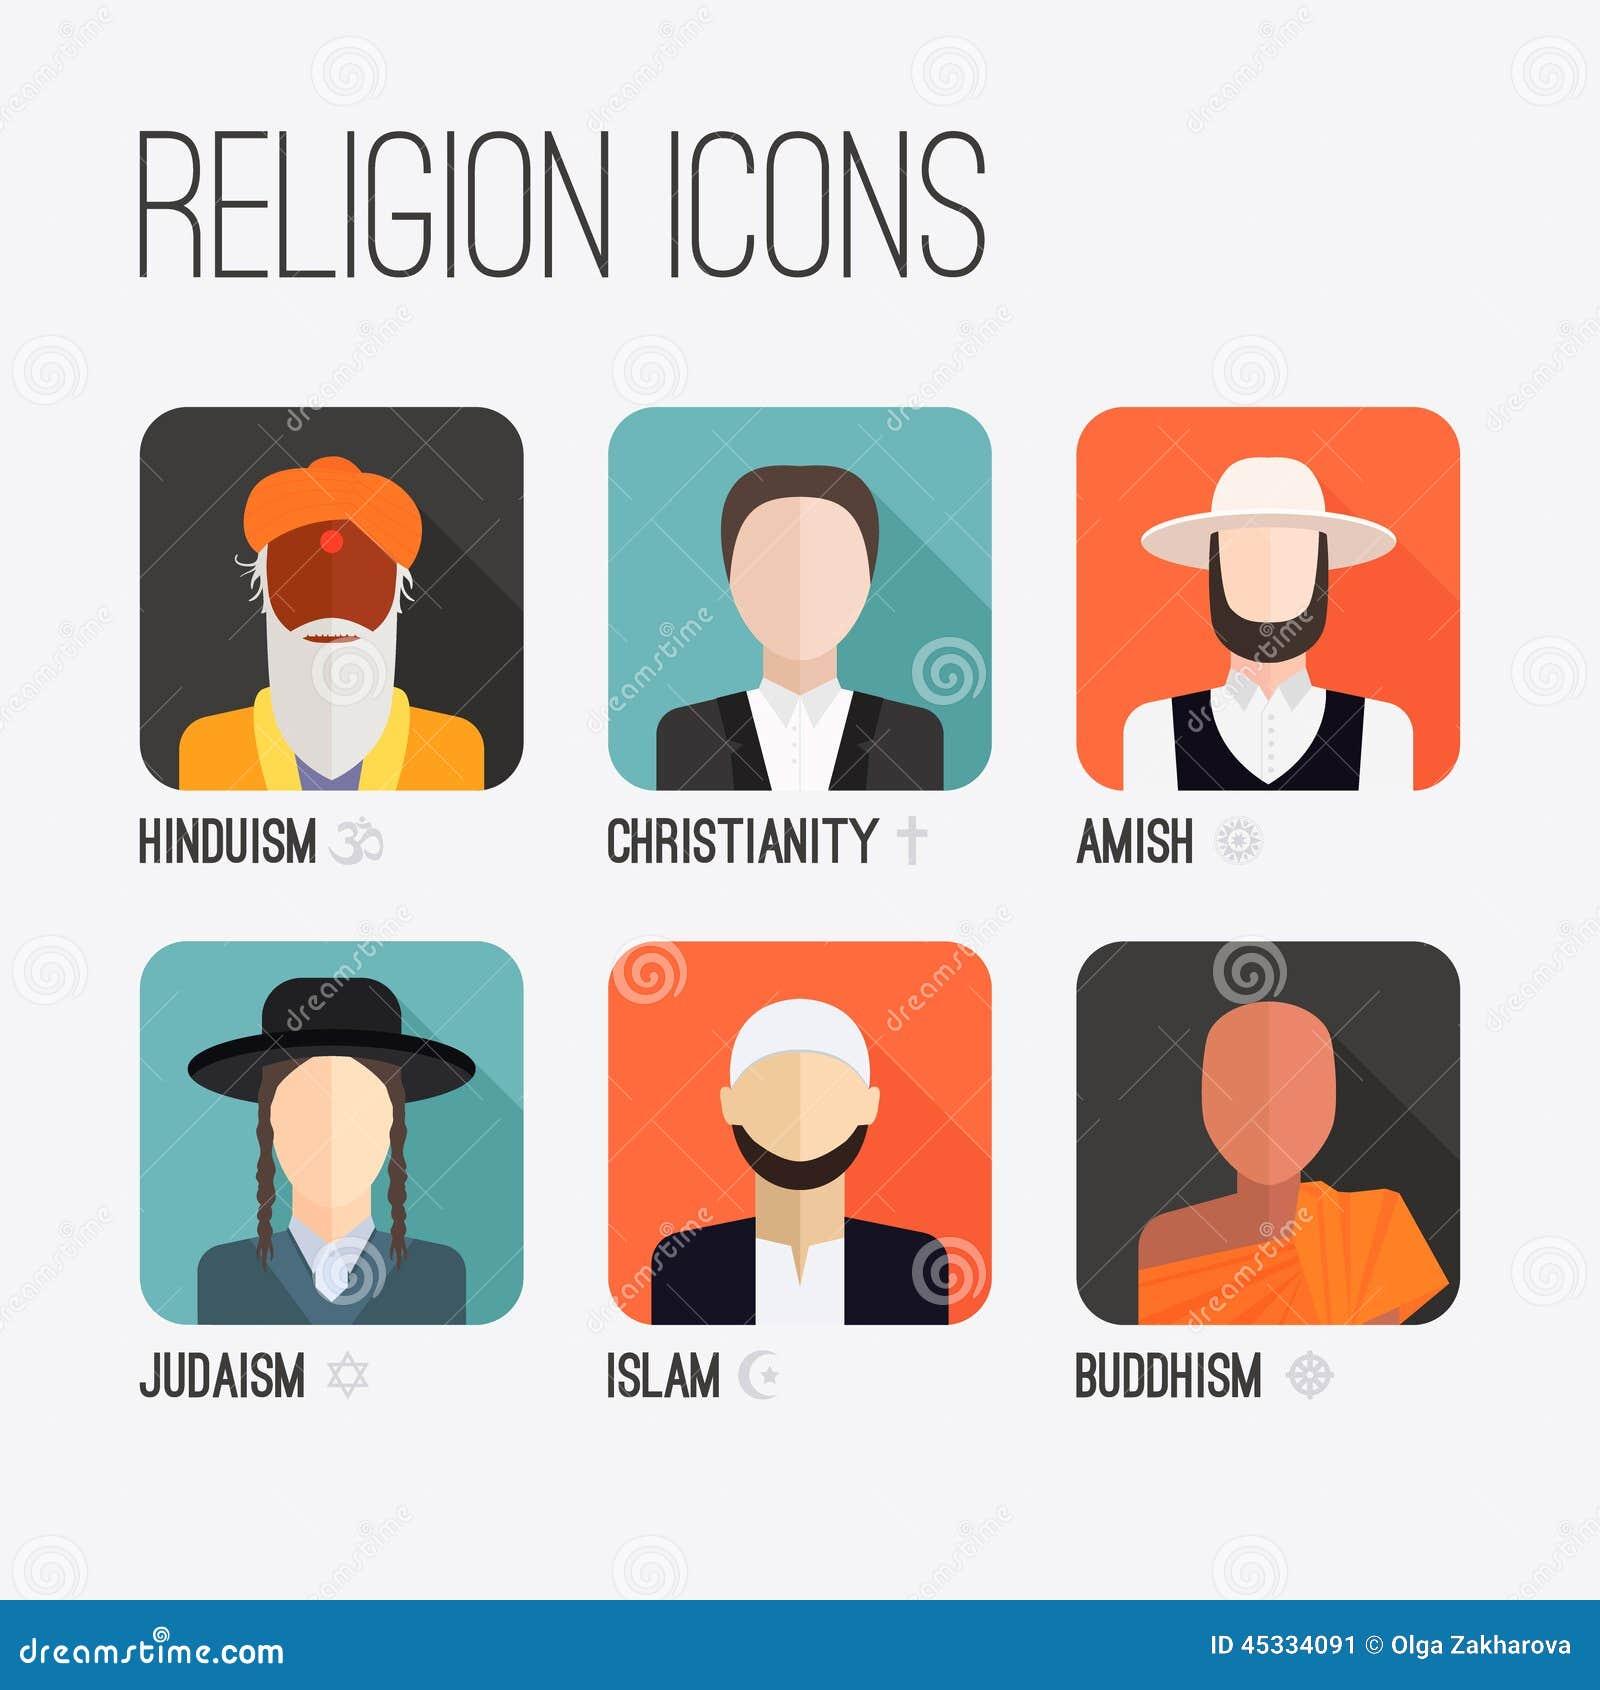 Hinduism and Judaism